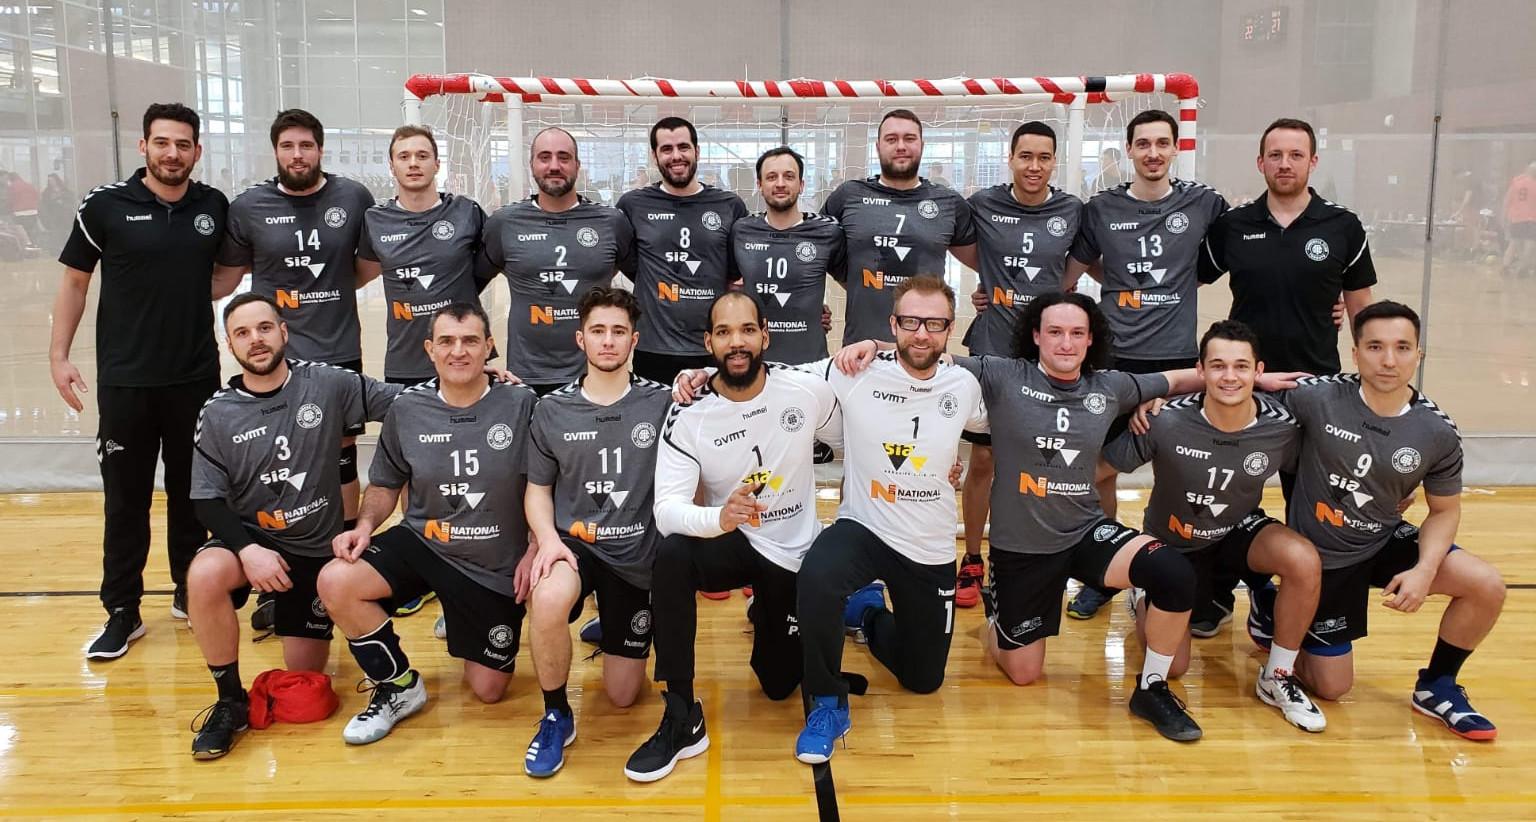 Arnold Sports Festival - Handball Club Toronto Roaster